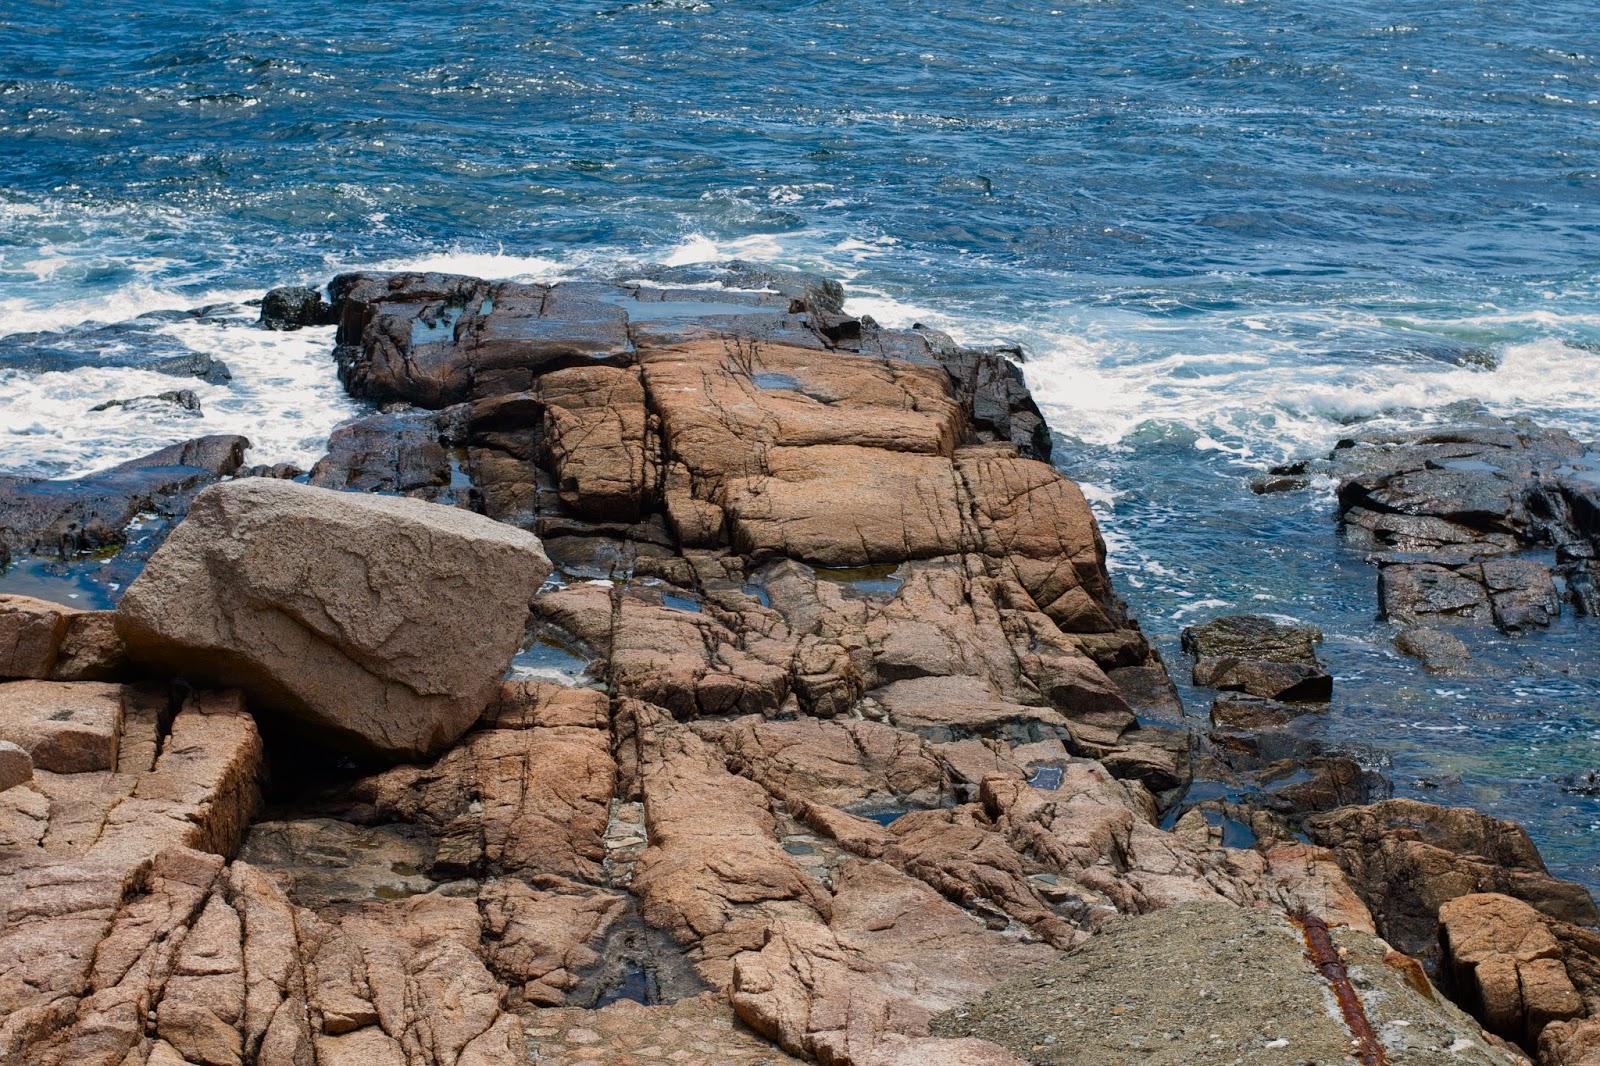 I enjoy watching the ocean breathe over the rocks along the coast.